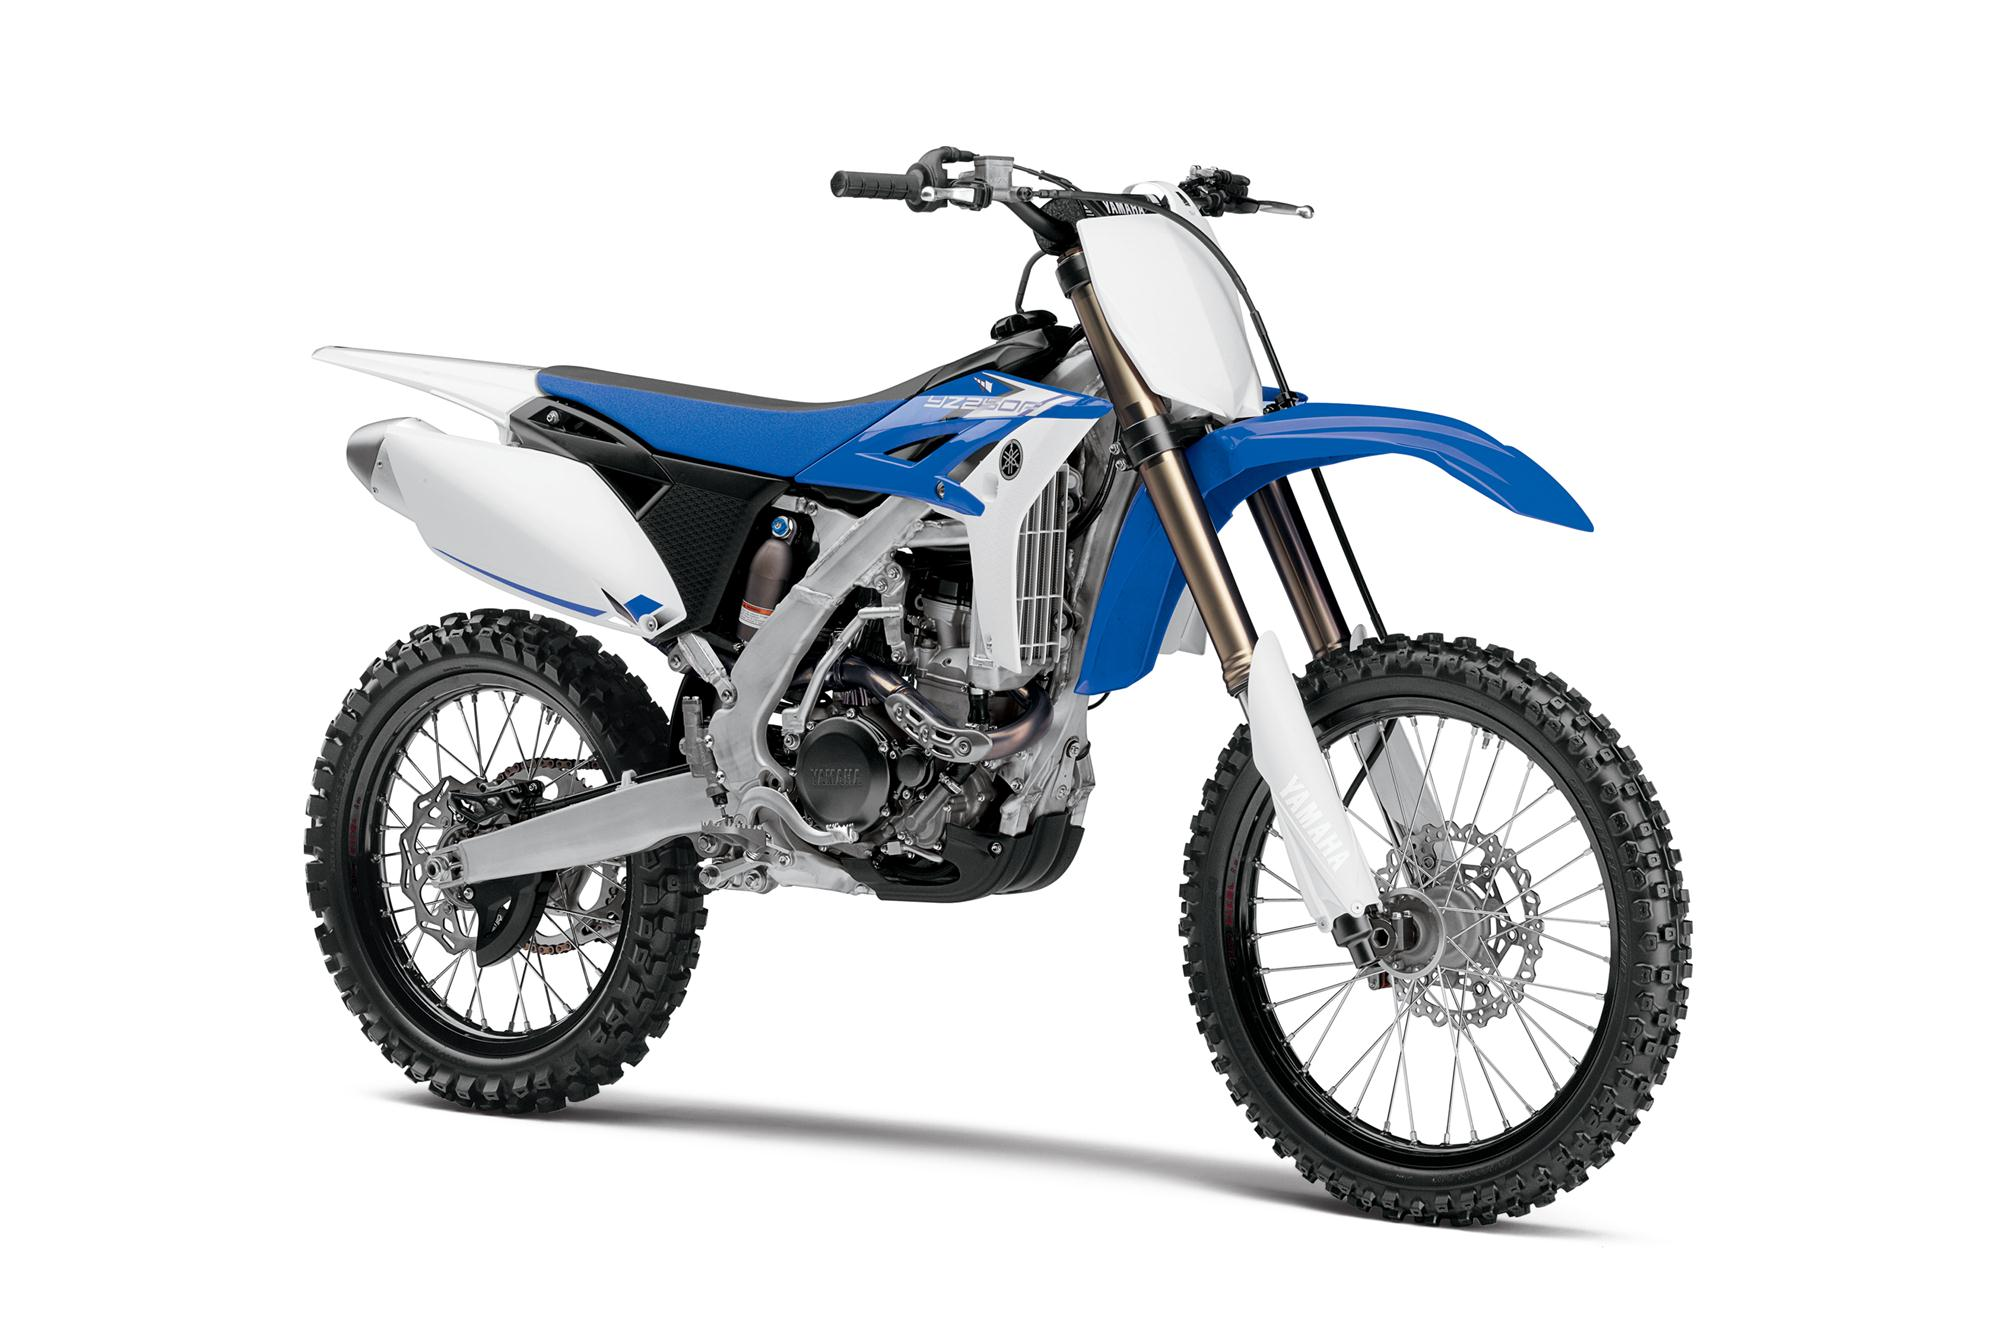 Yamaha Yz250f The Lightweight Dirt Racing Machine